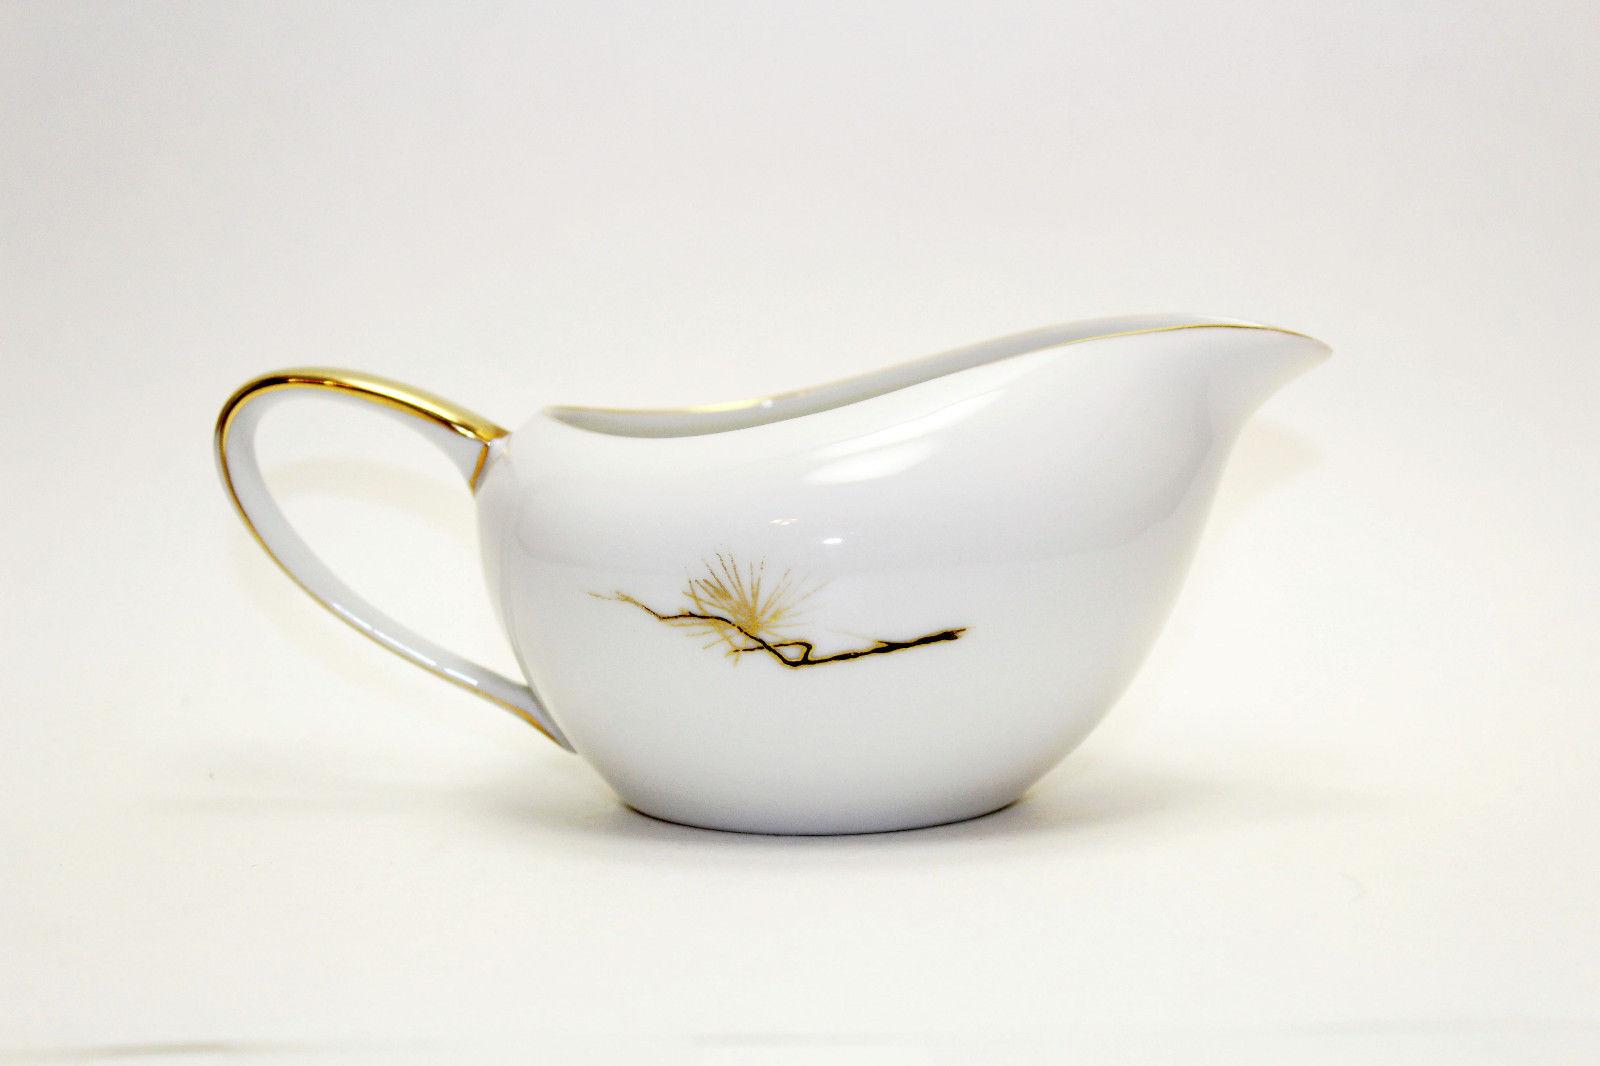 Hakone by Mikasa Pine Branch style Creamer - Pattern 8281 - $24.74